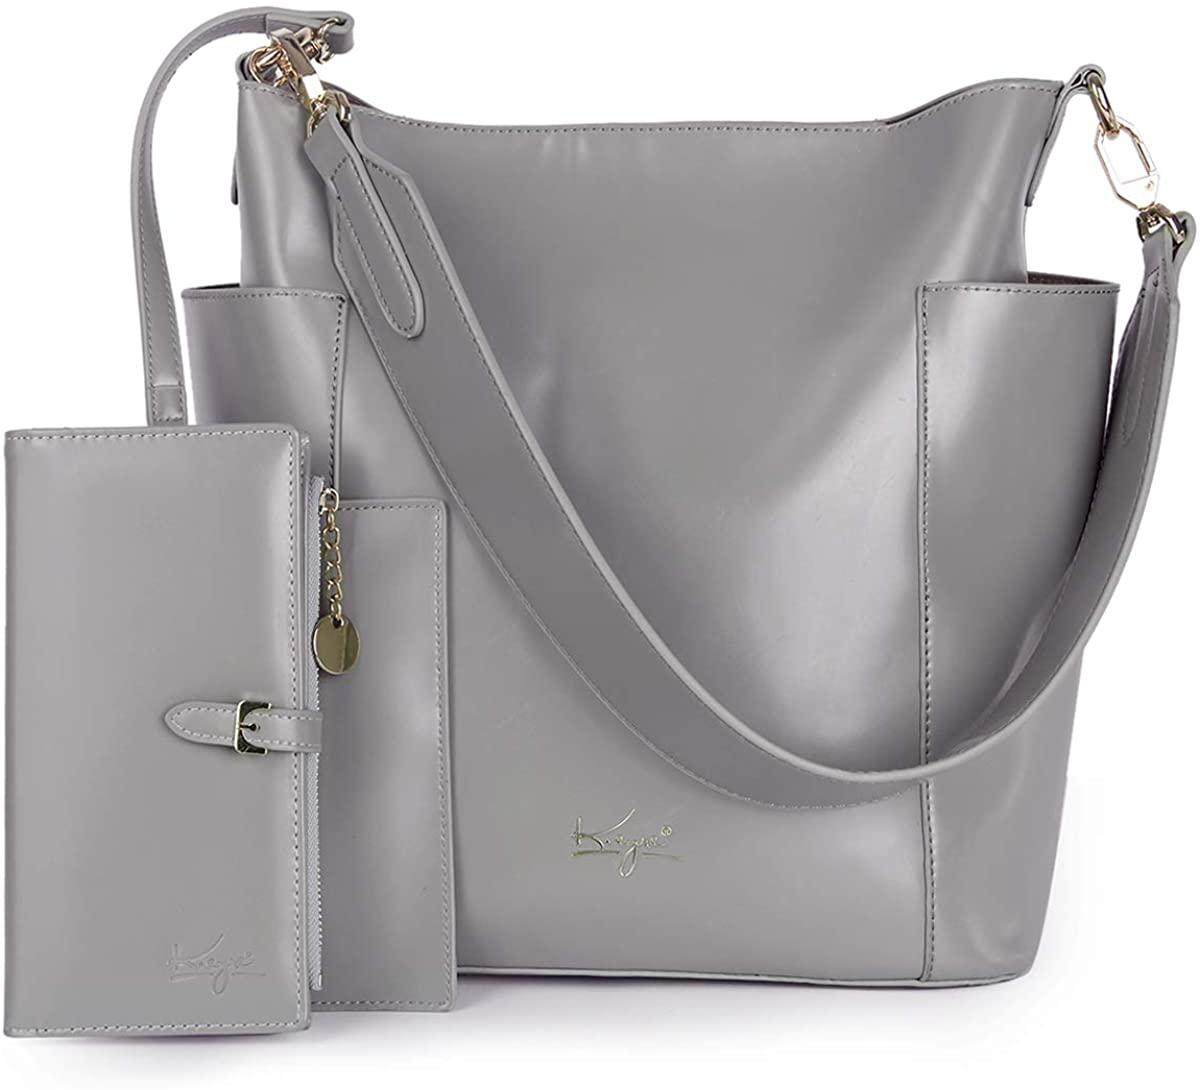 Women Handbag Designer Leather Hobo Handbags Shoulder Bucket Crossbody Purse 4PCs